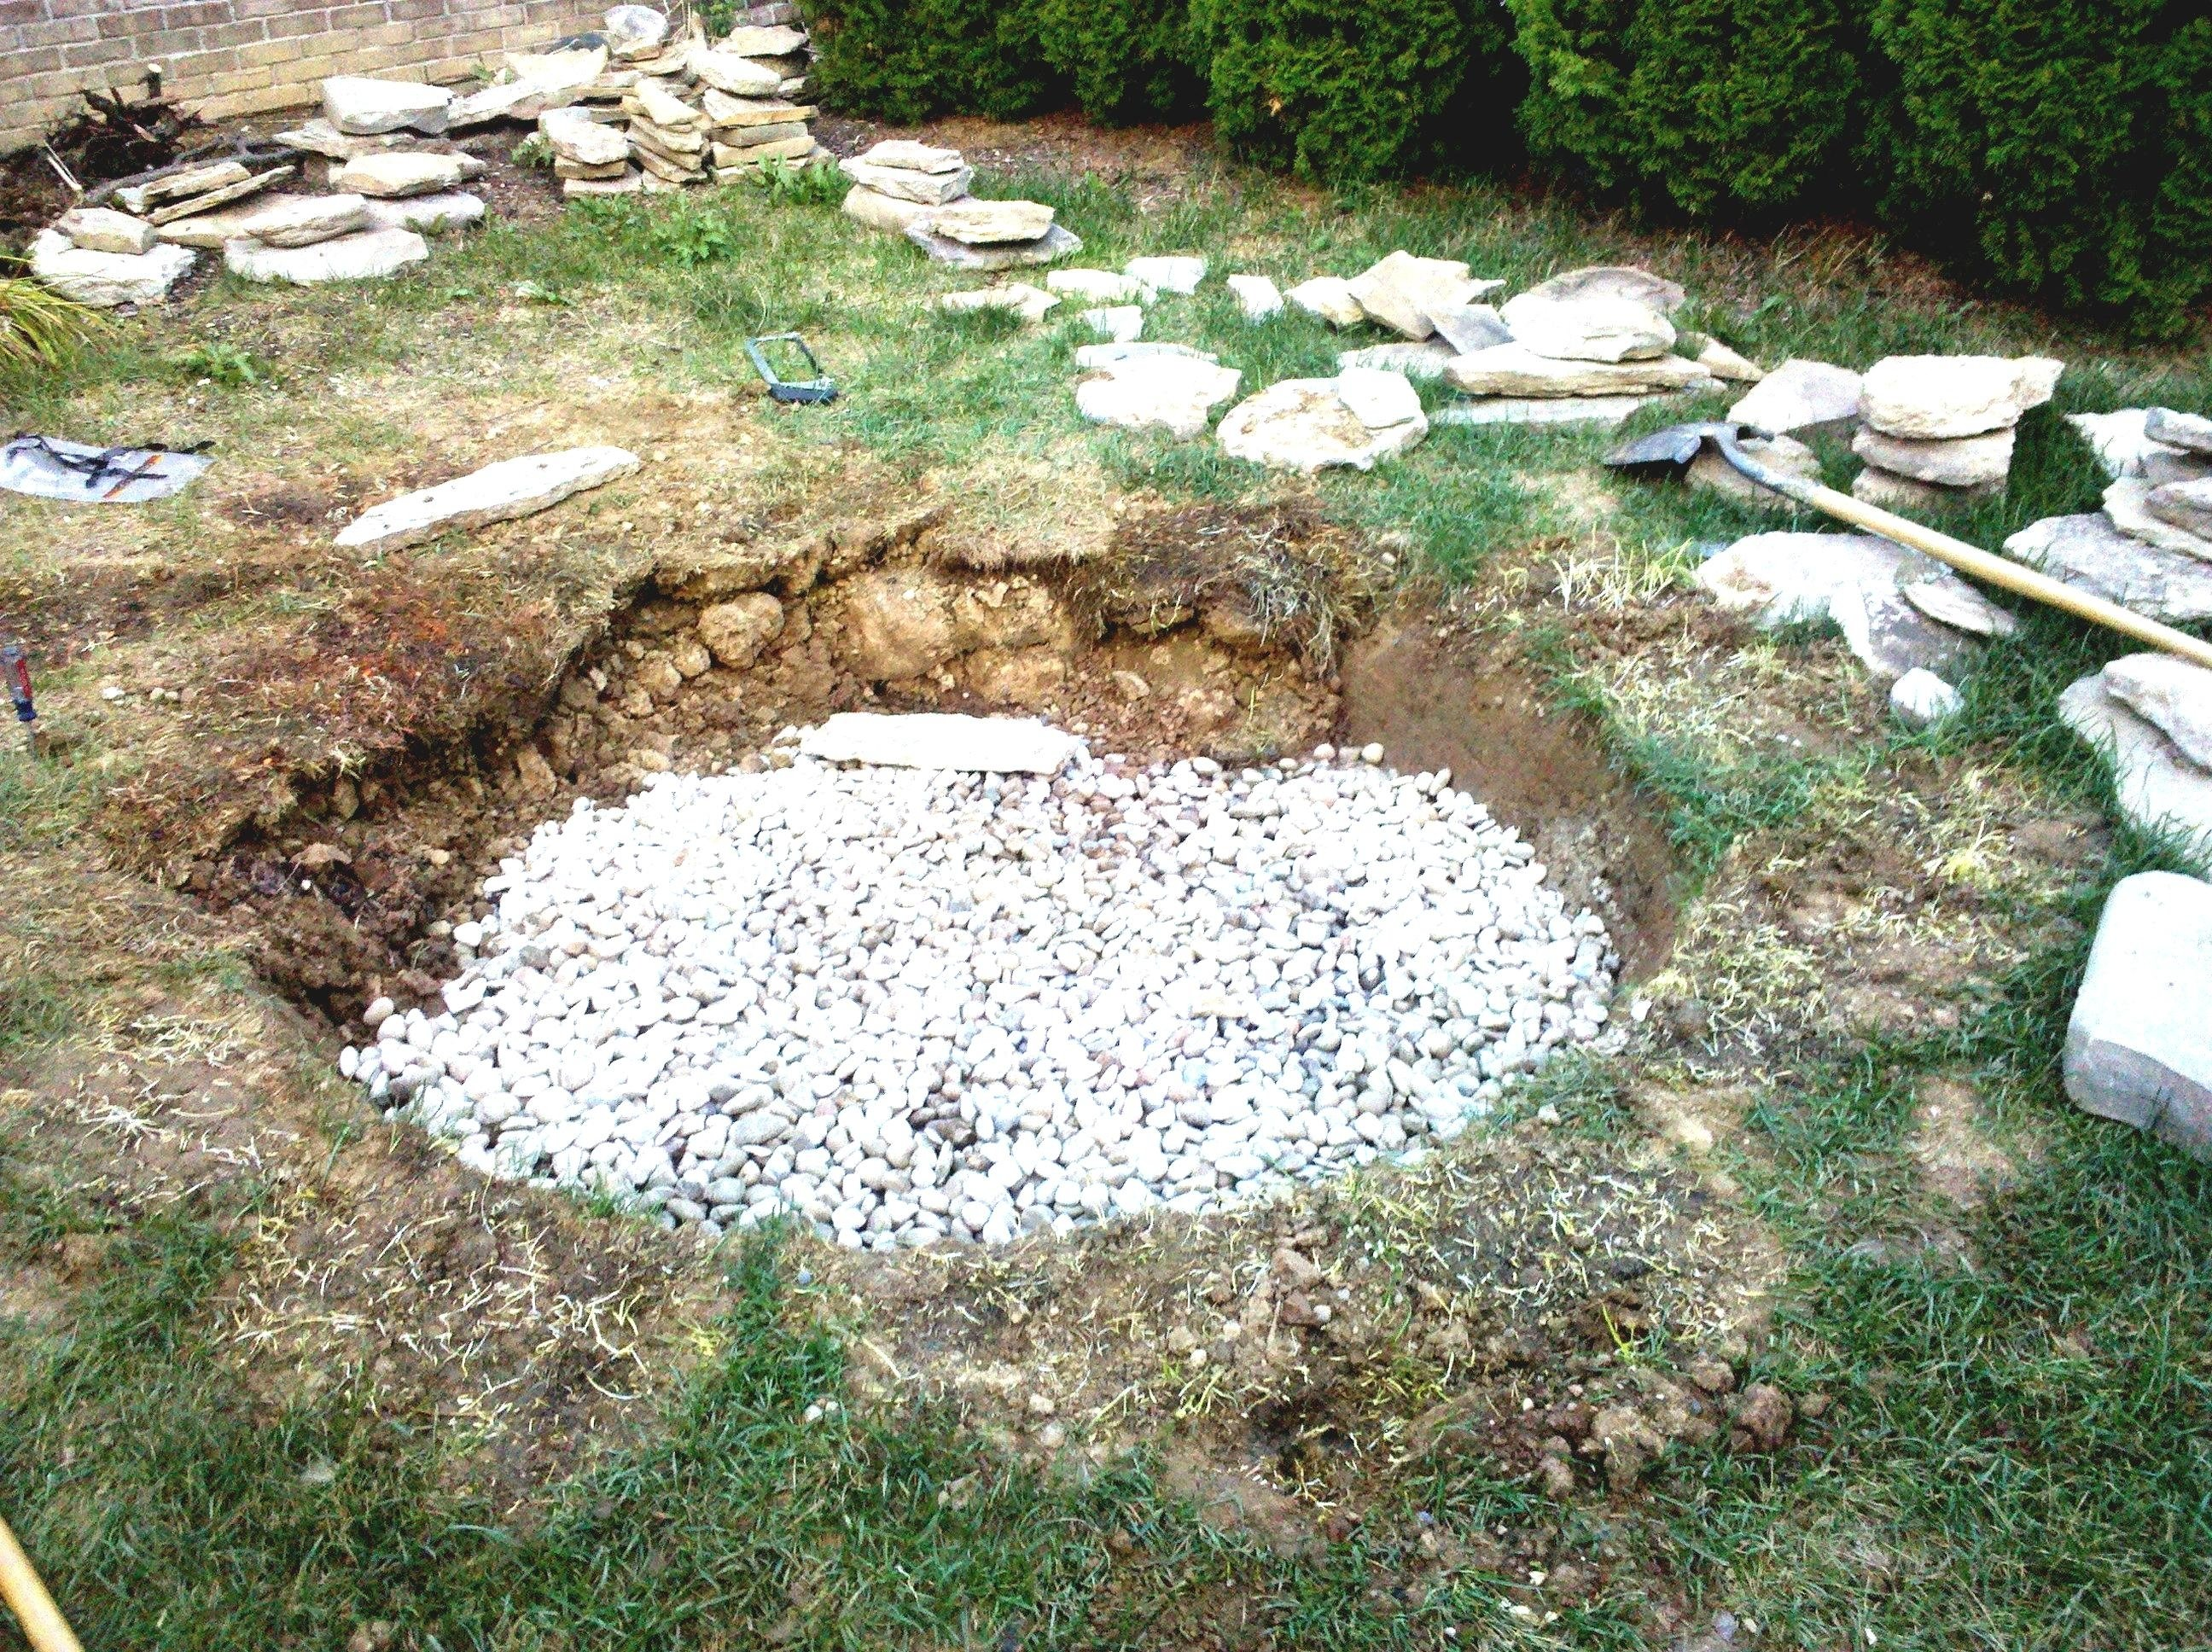 10 Fantastic In Ground Fire Pit Ideas backyard in ground fire pit ideas front door hall home design 2021